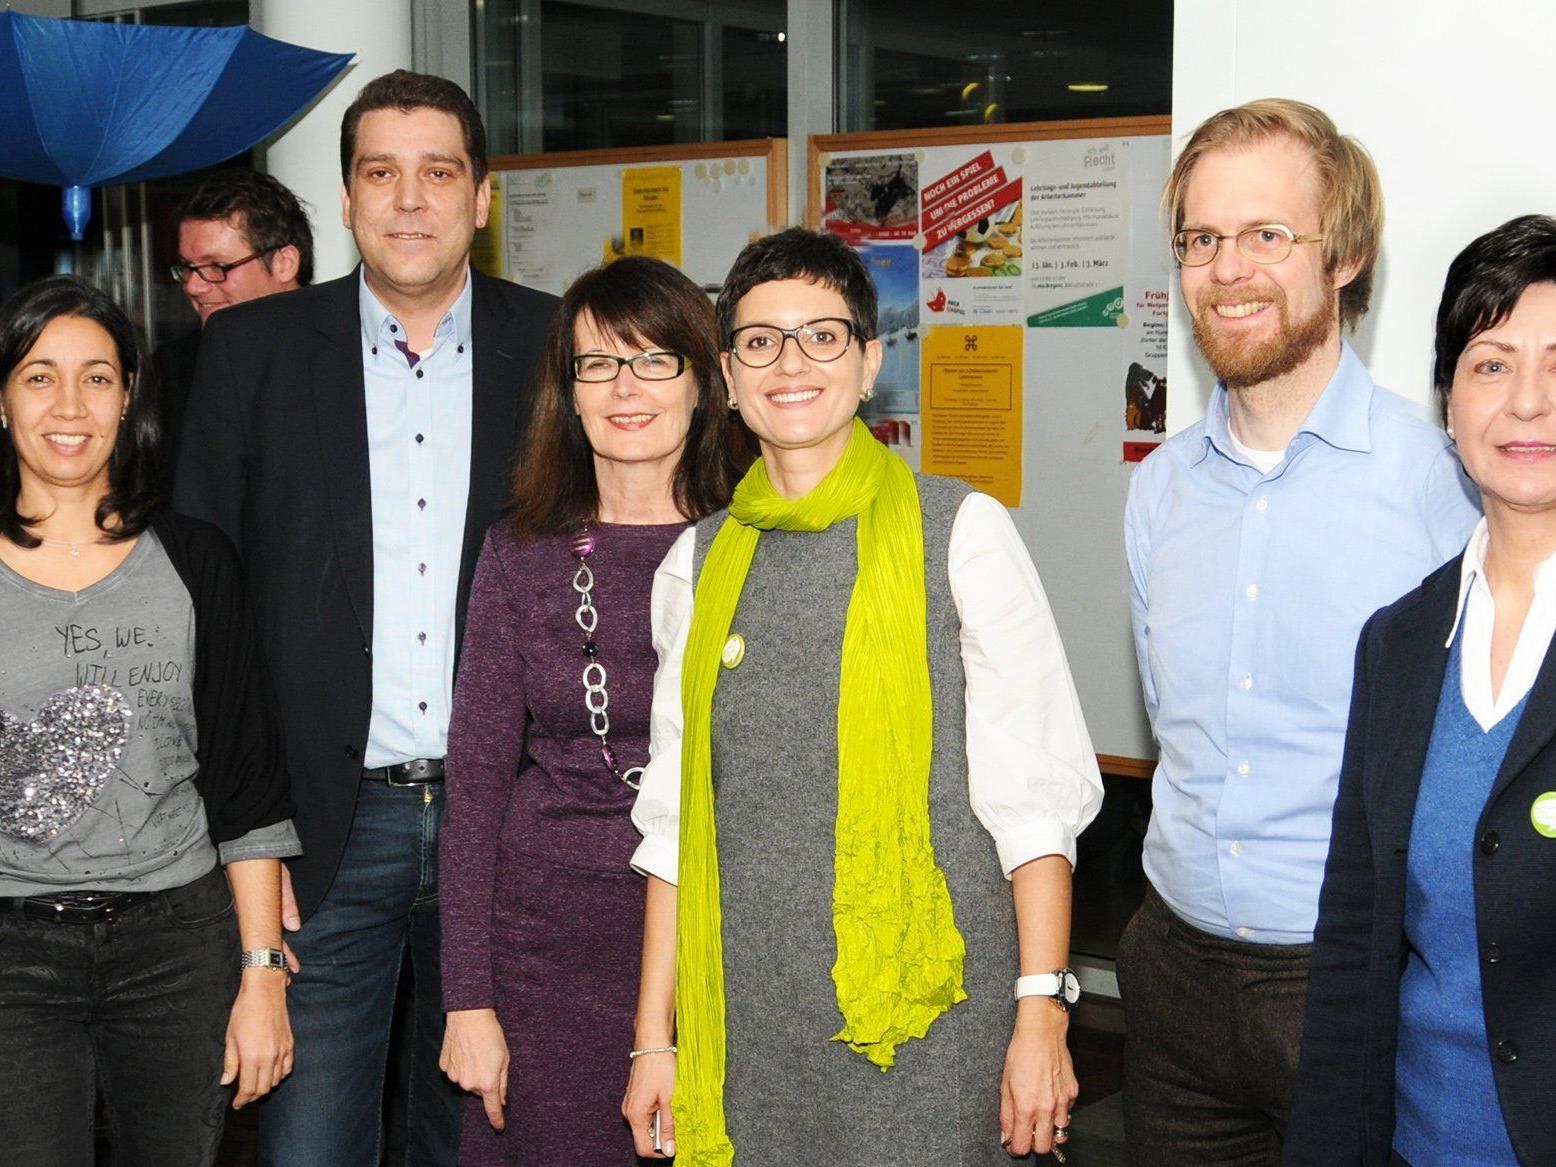 Michaela Blum, Bgm. Harald Köhlmeier, Evi Mair, Leila Götze, Dr. Simon Burtscher-Mathis und Rosi Meichenitsch